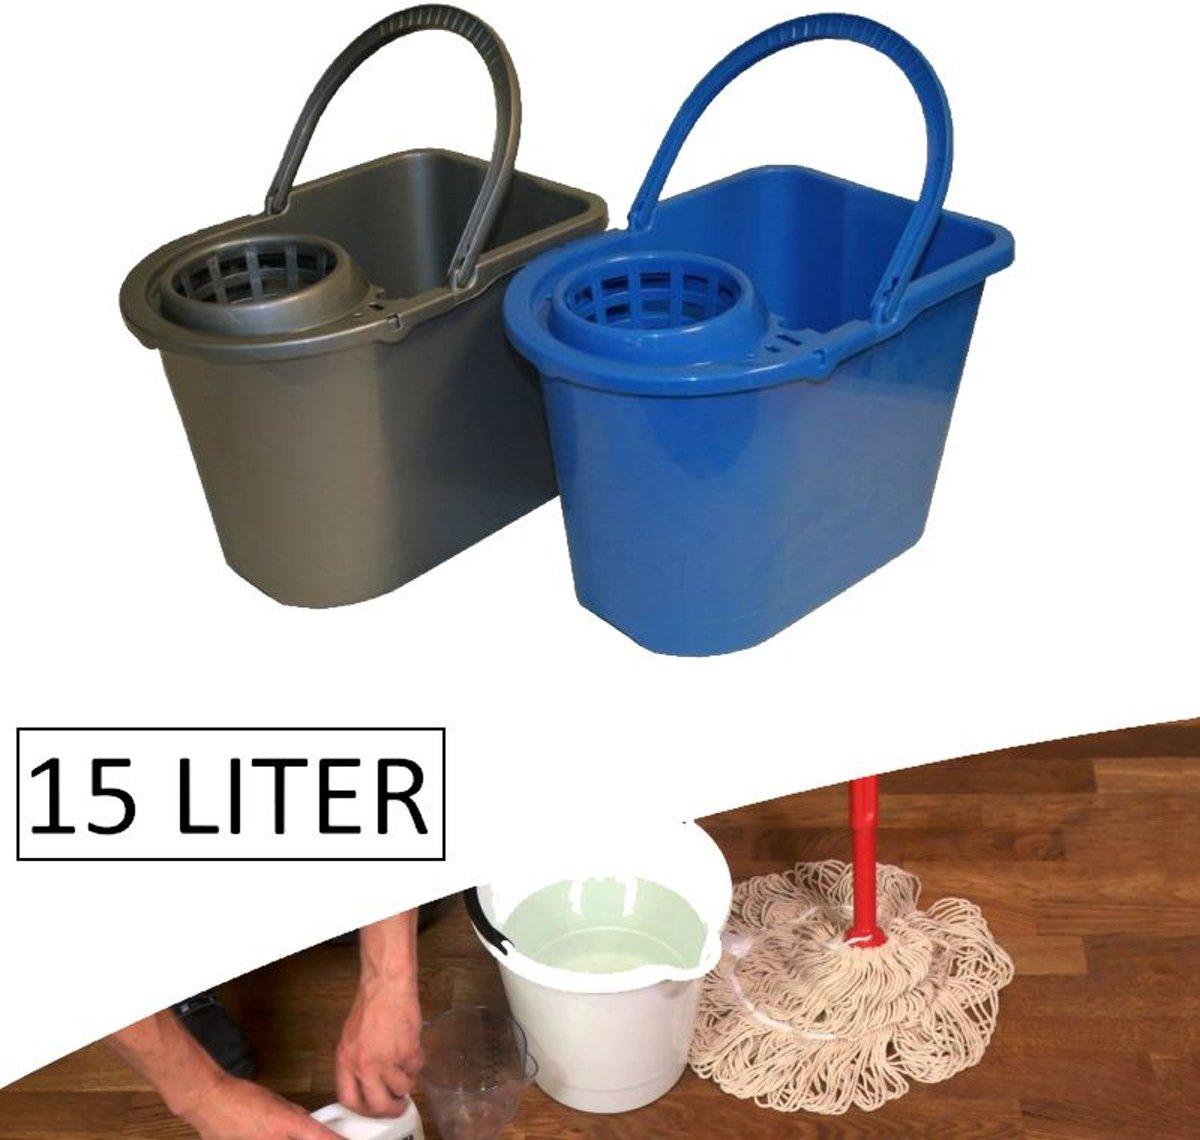 2Clean Dweilemmer / Mopemmer 15 liter Met Wringer (prijs per stuk) kopen